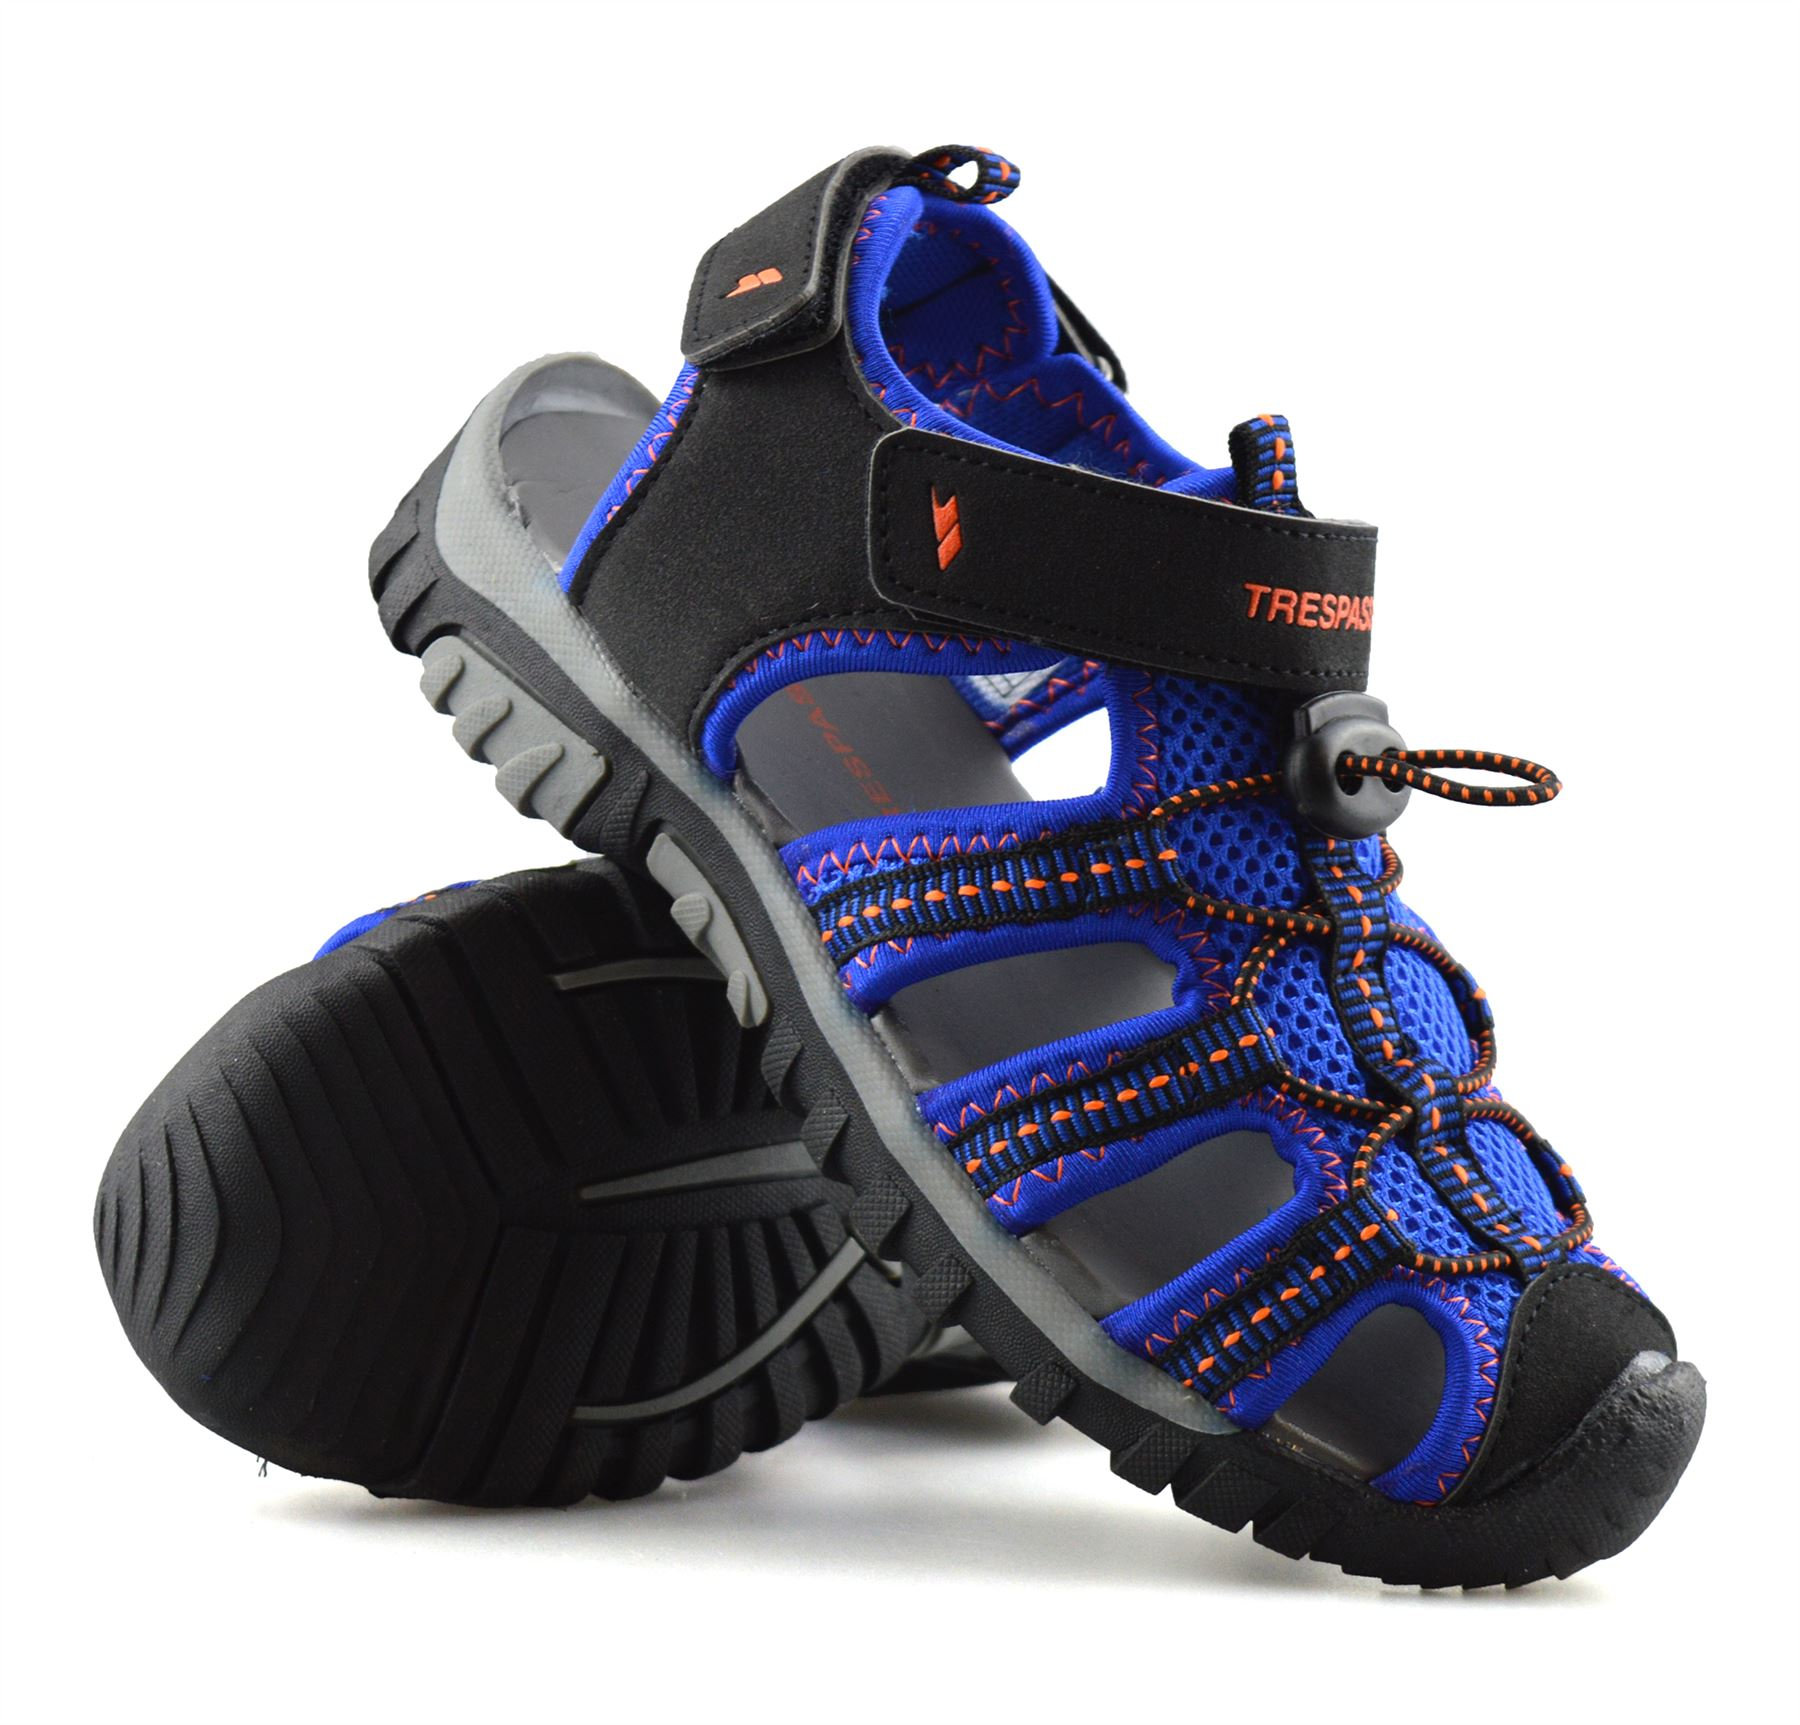 Boys-Girls-Kids-Trespass-Summer-Beach-Casual-Walking-Sports-Sandals-Shoes-Size thumbnail 15